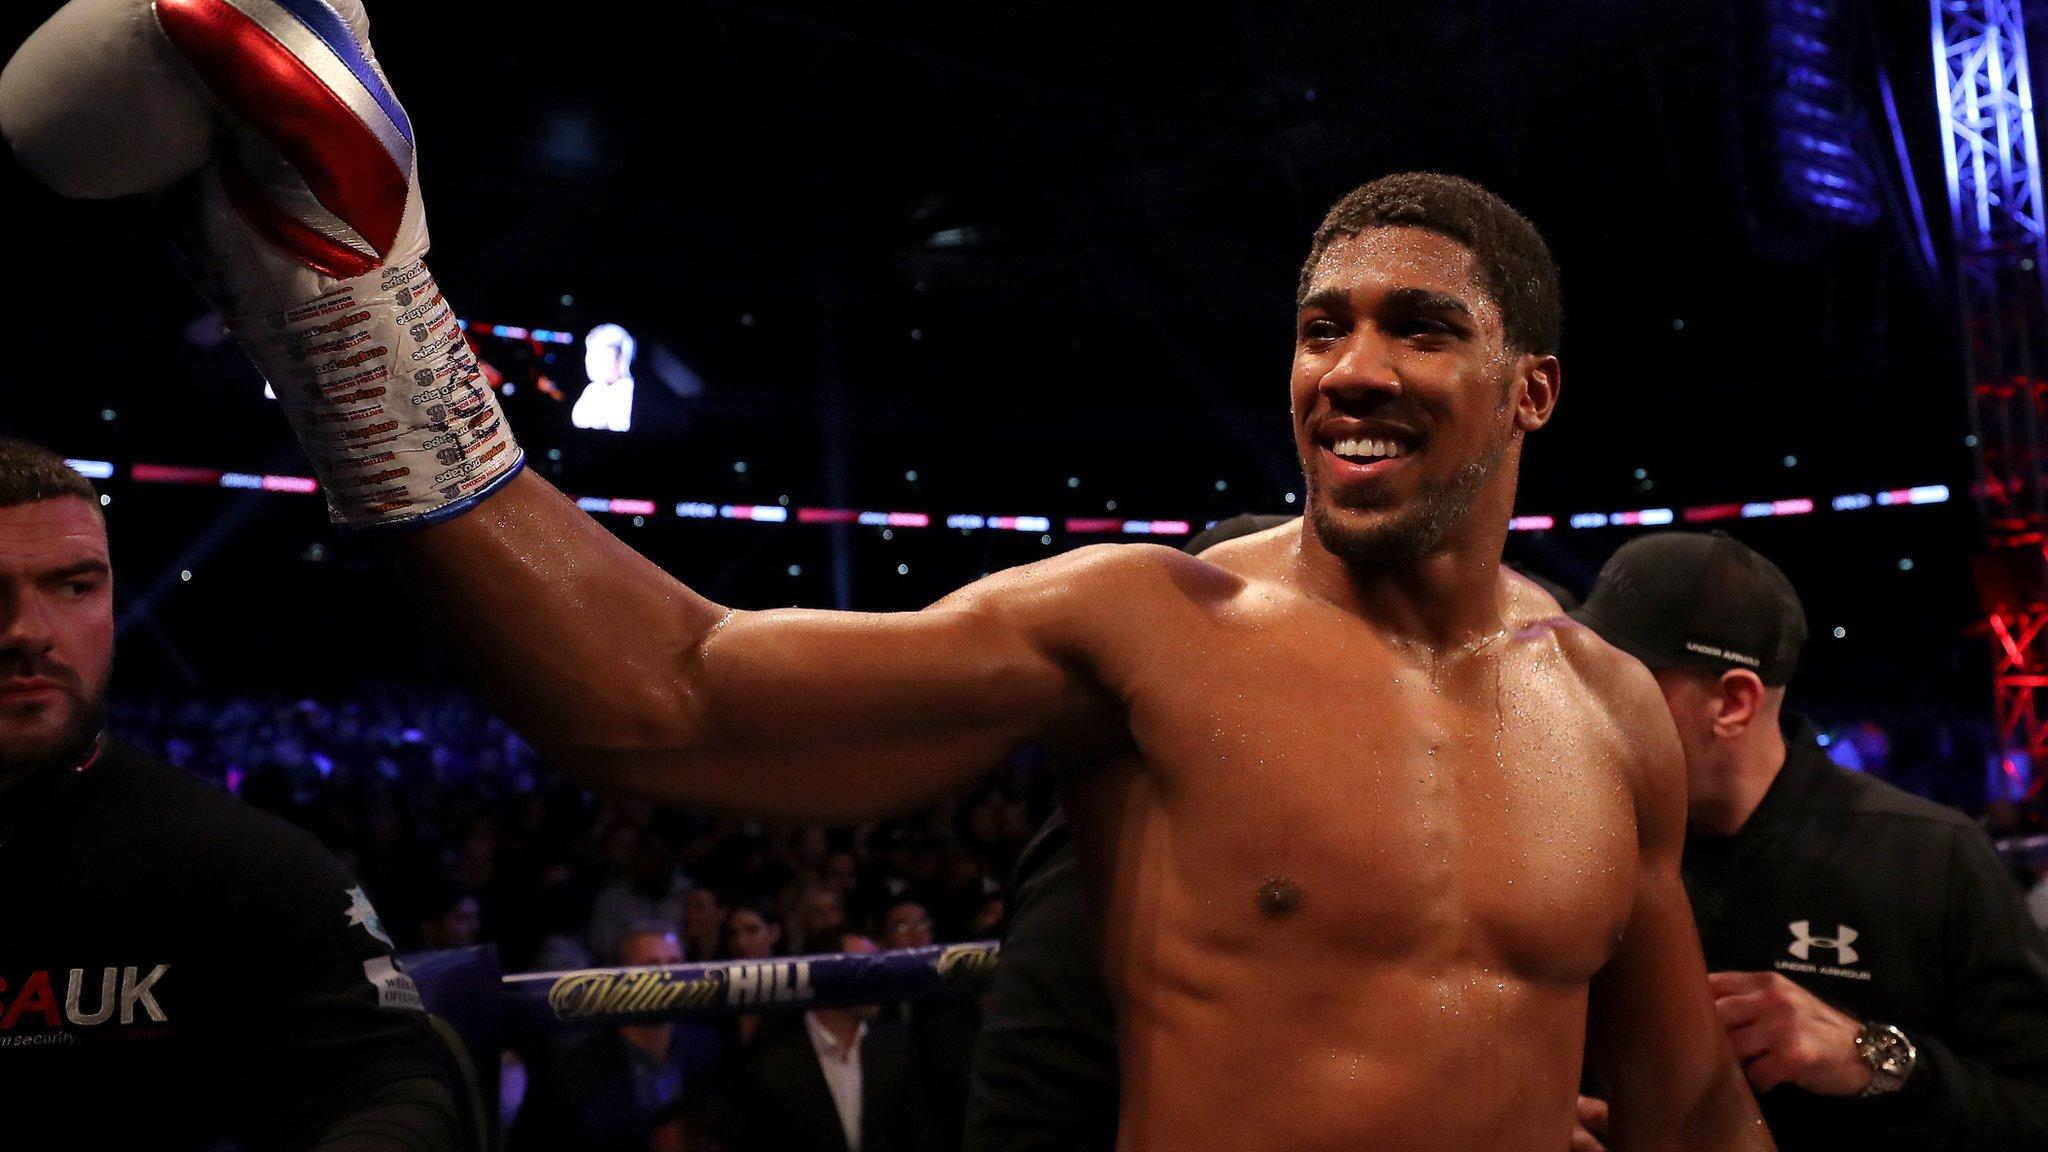 Wilder v Fury rematch? Wilder v Joshua? Joshua v Fury? What next for heavyweight division?